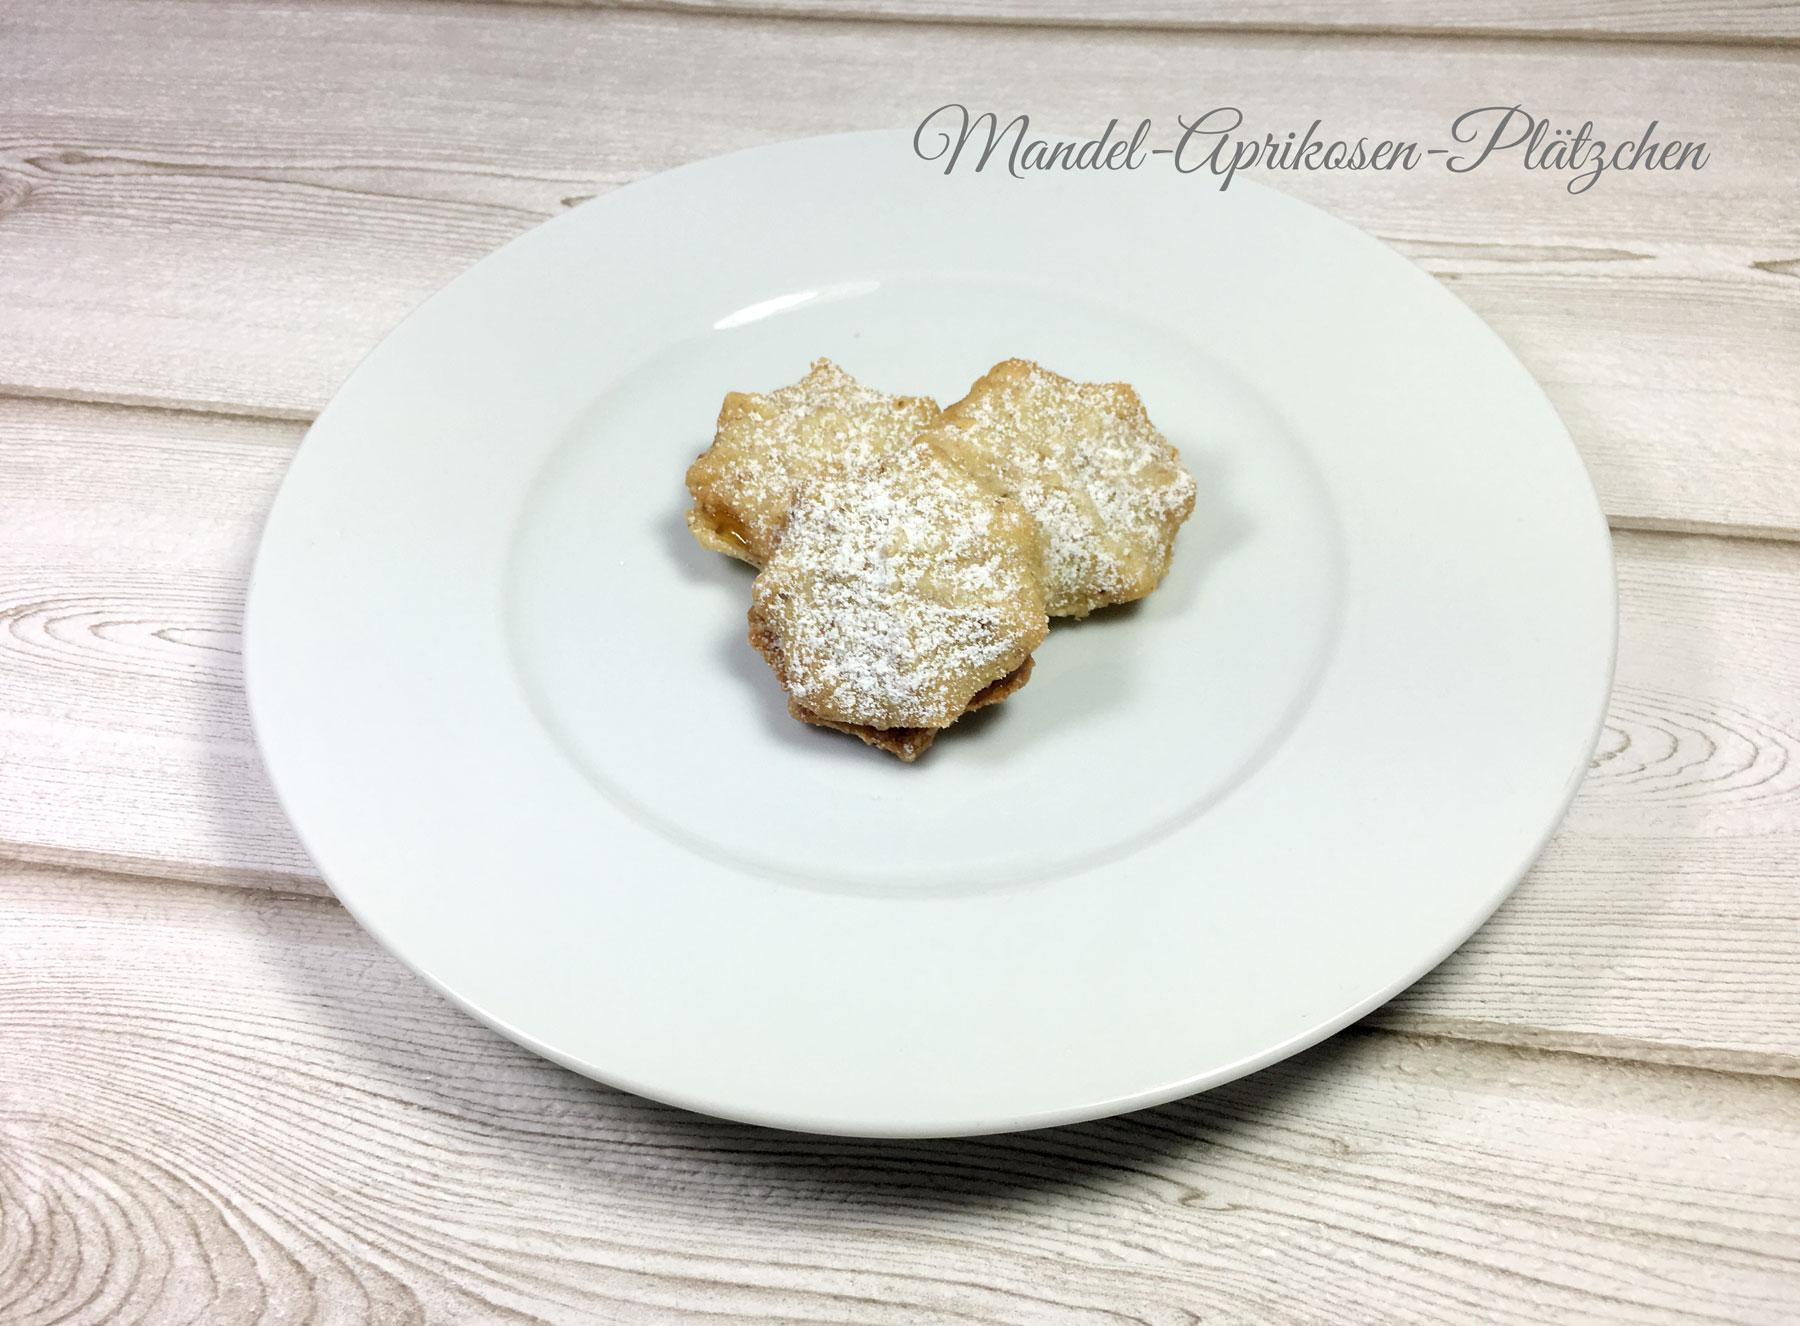 Mandel-Aprikosen-Plätzchen